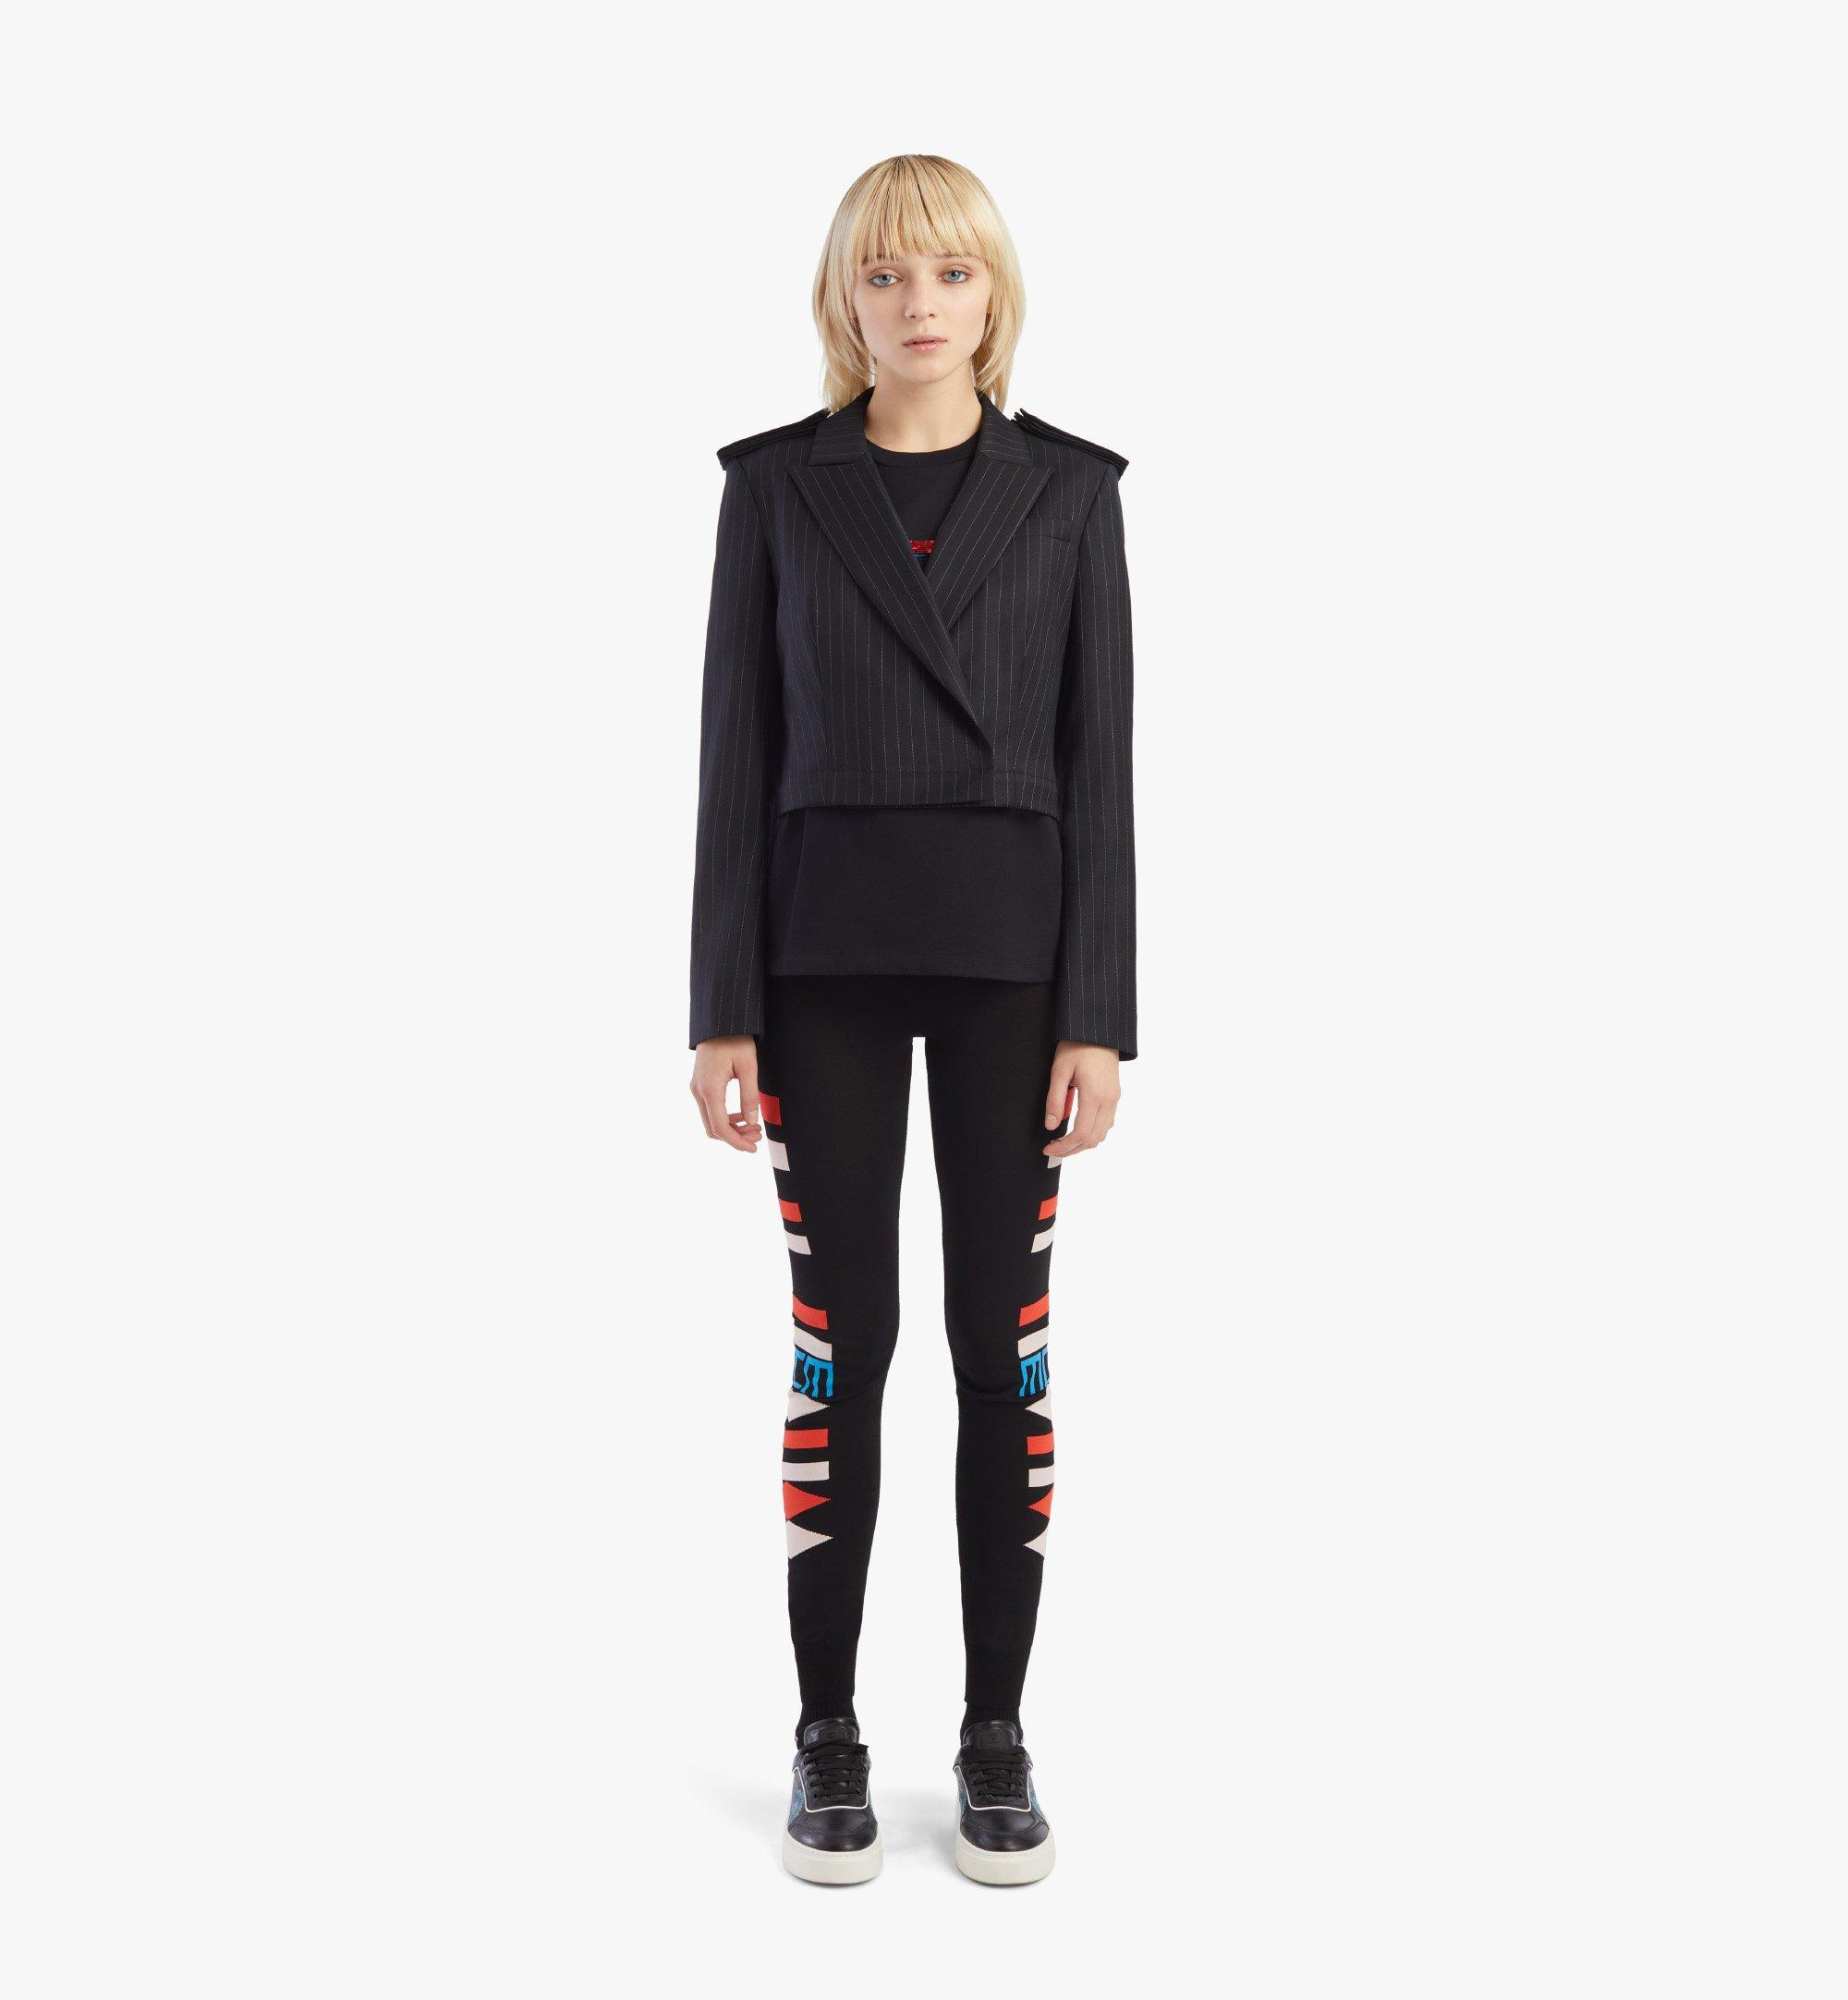 MCM 女士肩章羊毛西裝外套 Black MFJBSMM02B2040 更多視圖 4